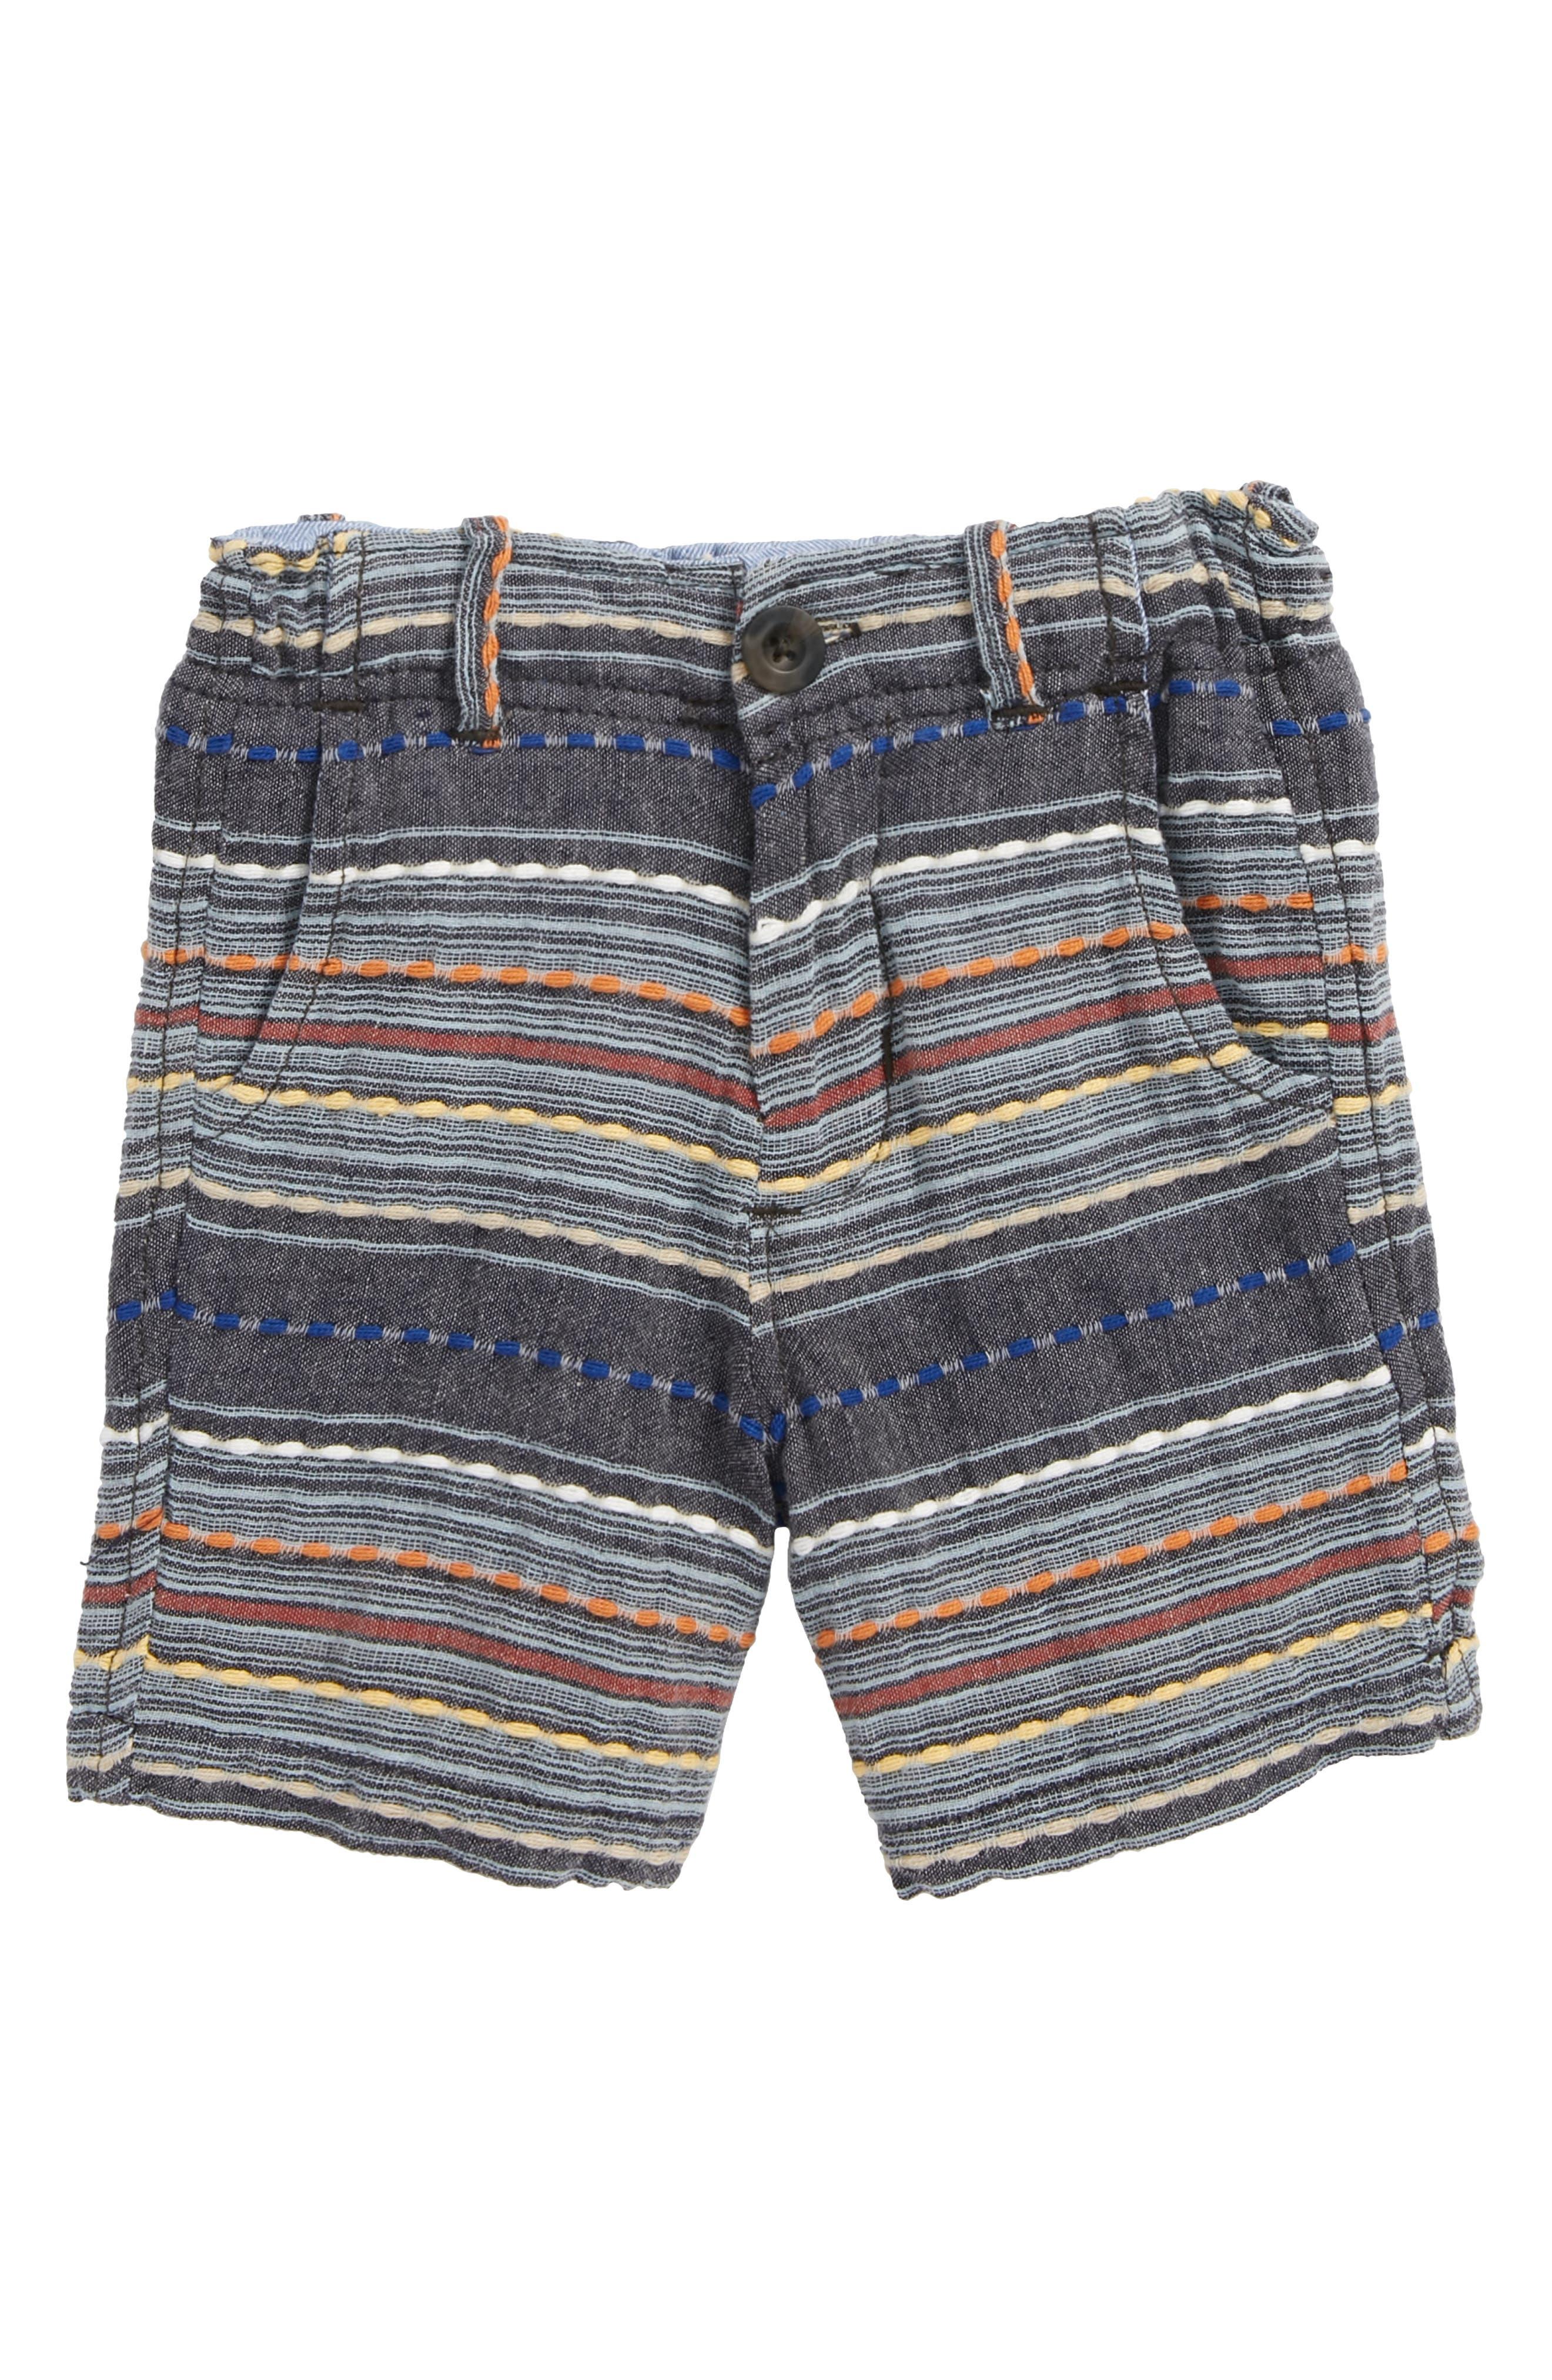 Wyatt Shorts,                         Main,                         color, 020